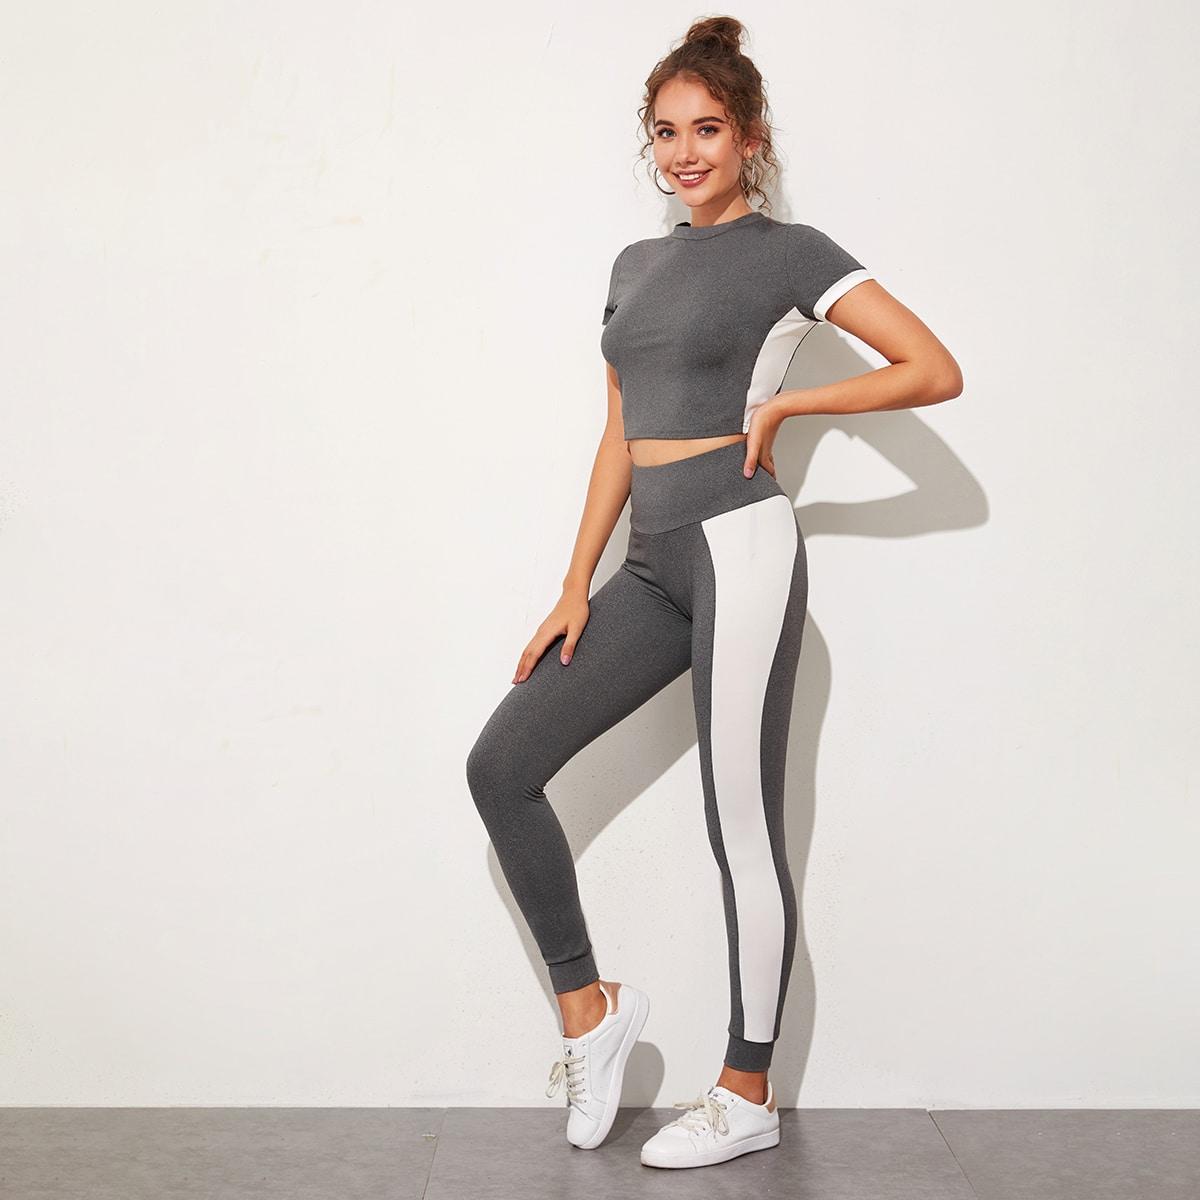 SHEIN / Two Tone Crop Top & Contrast Sideseam Leggings Set